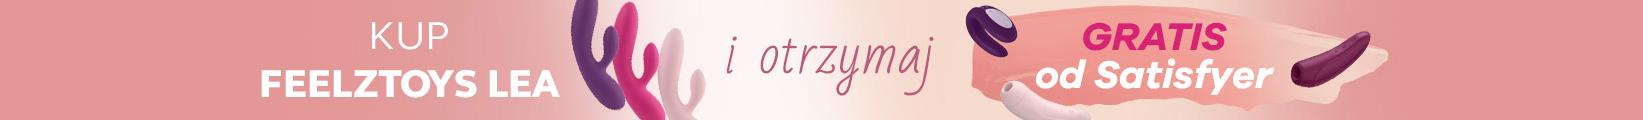 feelztoys-lea